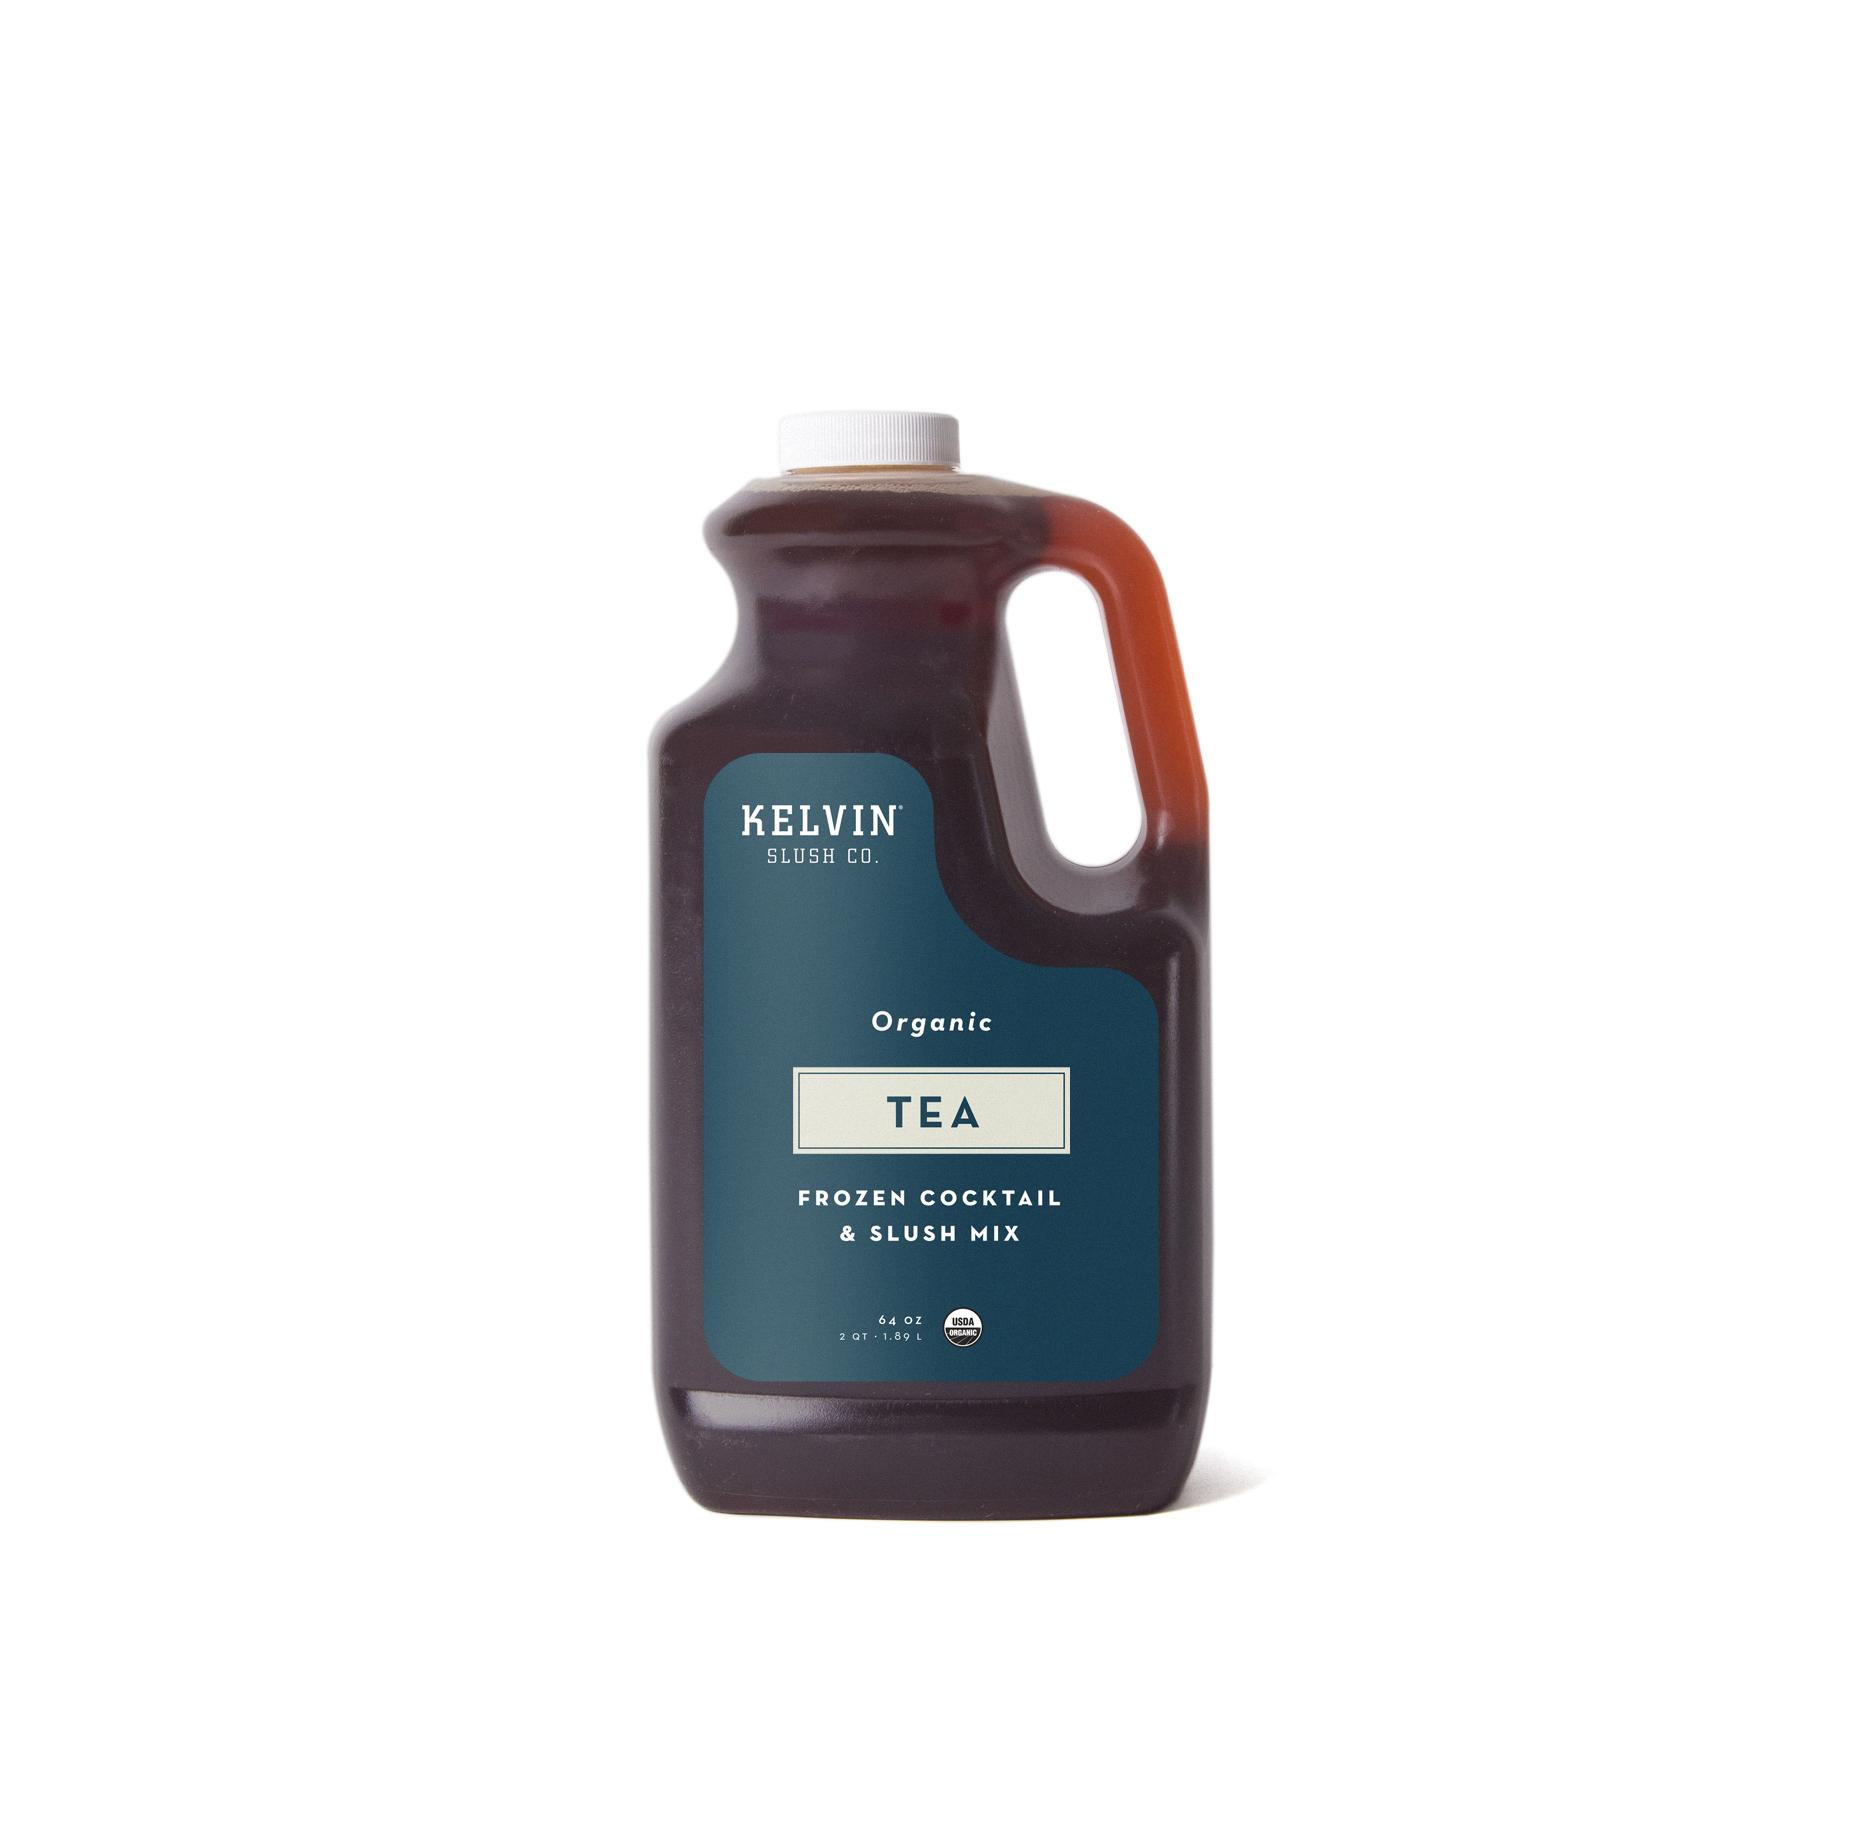 Kelvin Slush Tea mix in a plastic container.